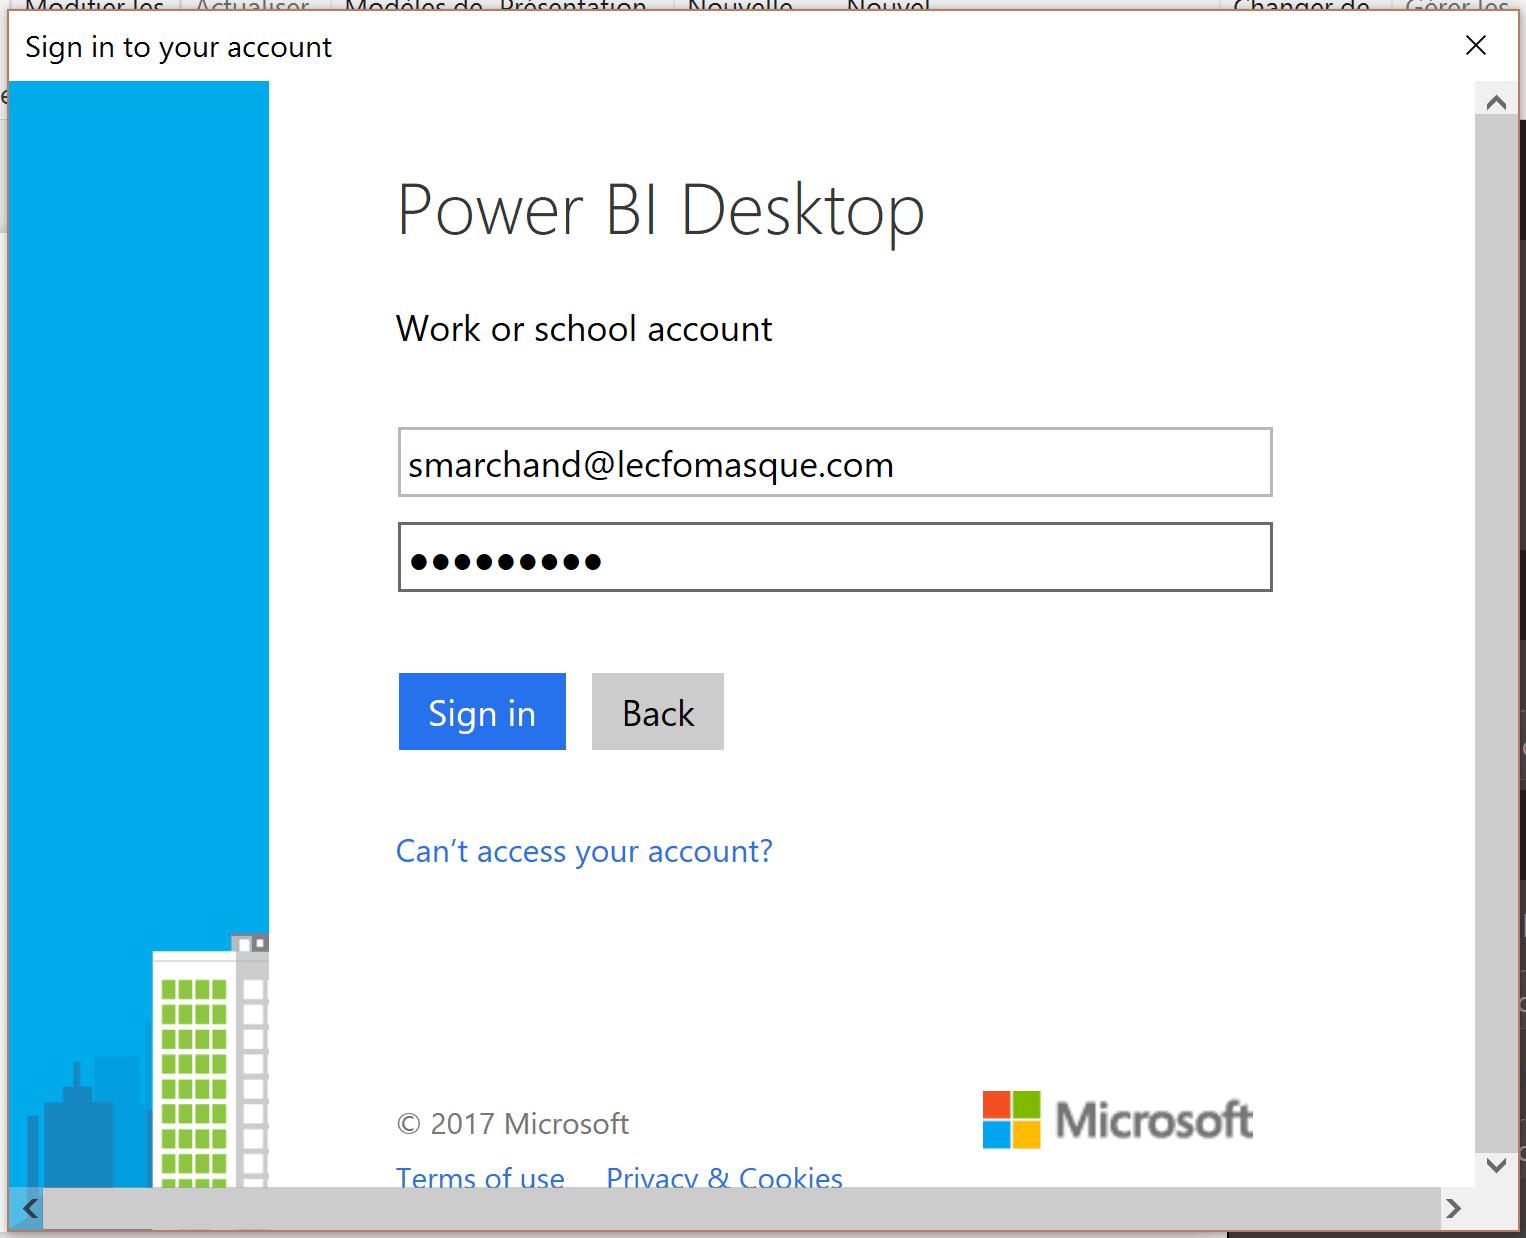 Power BI Desktop connexion